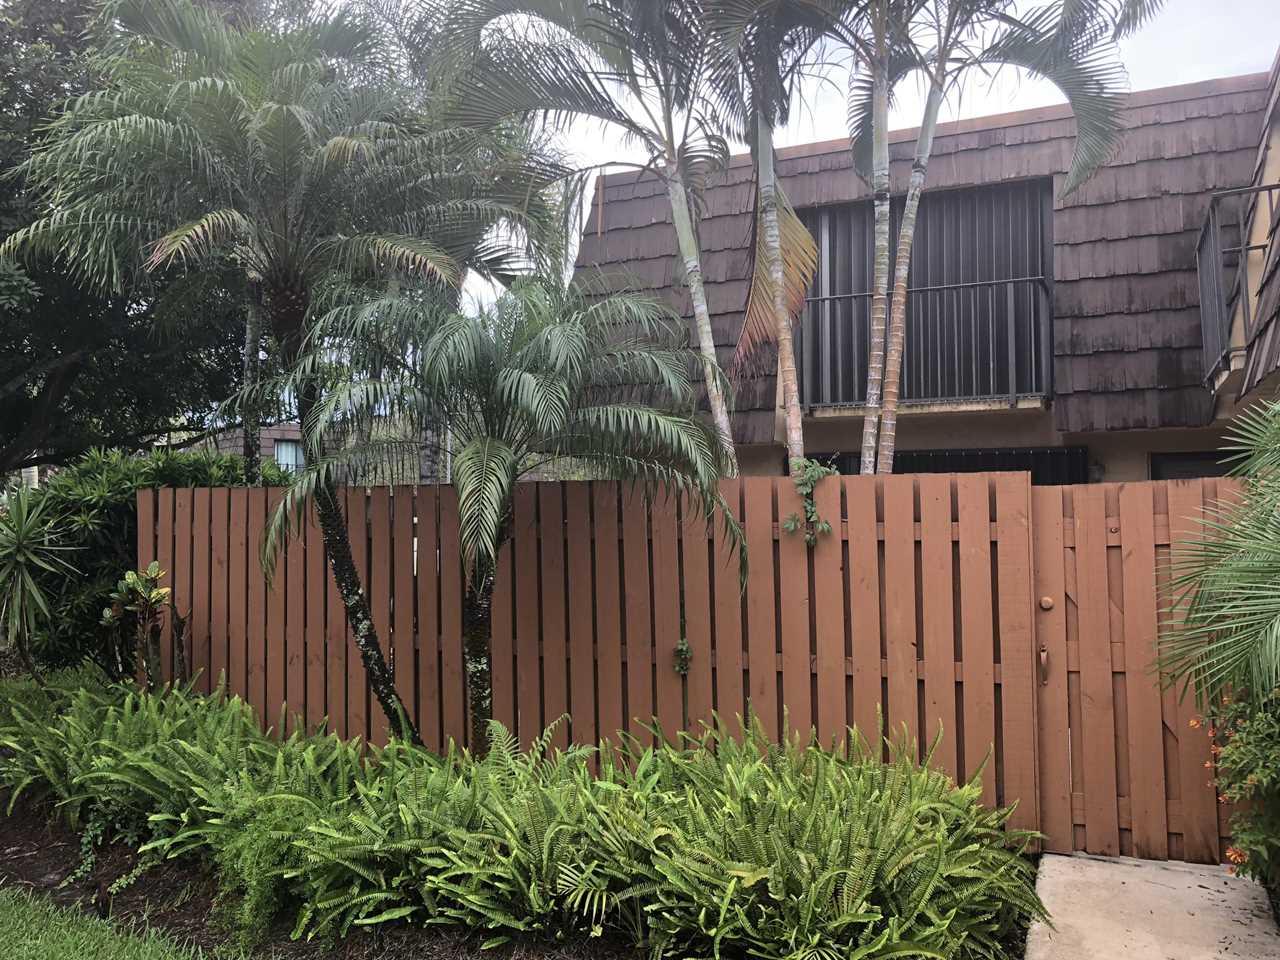 5658 SE Windsong Lane Stuart, FL 34997 | MLS RX-10457122 Photo 1